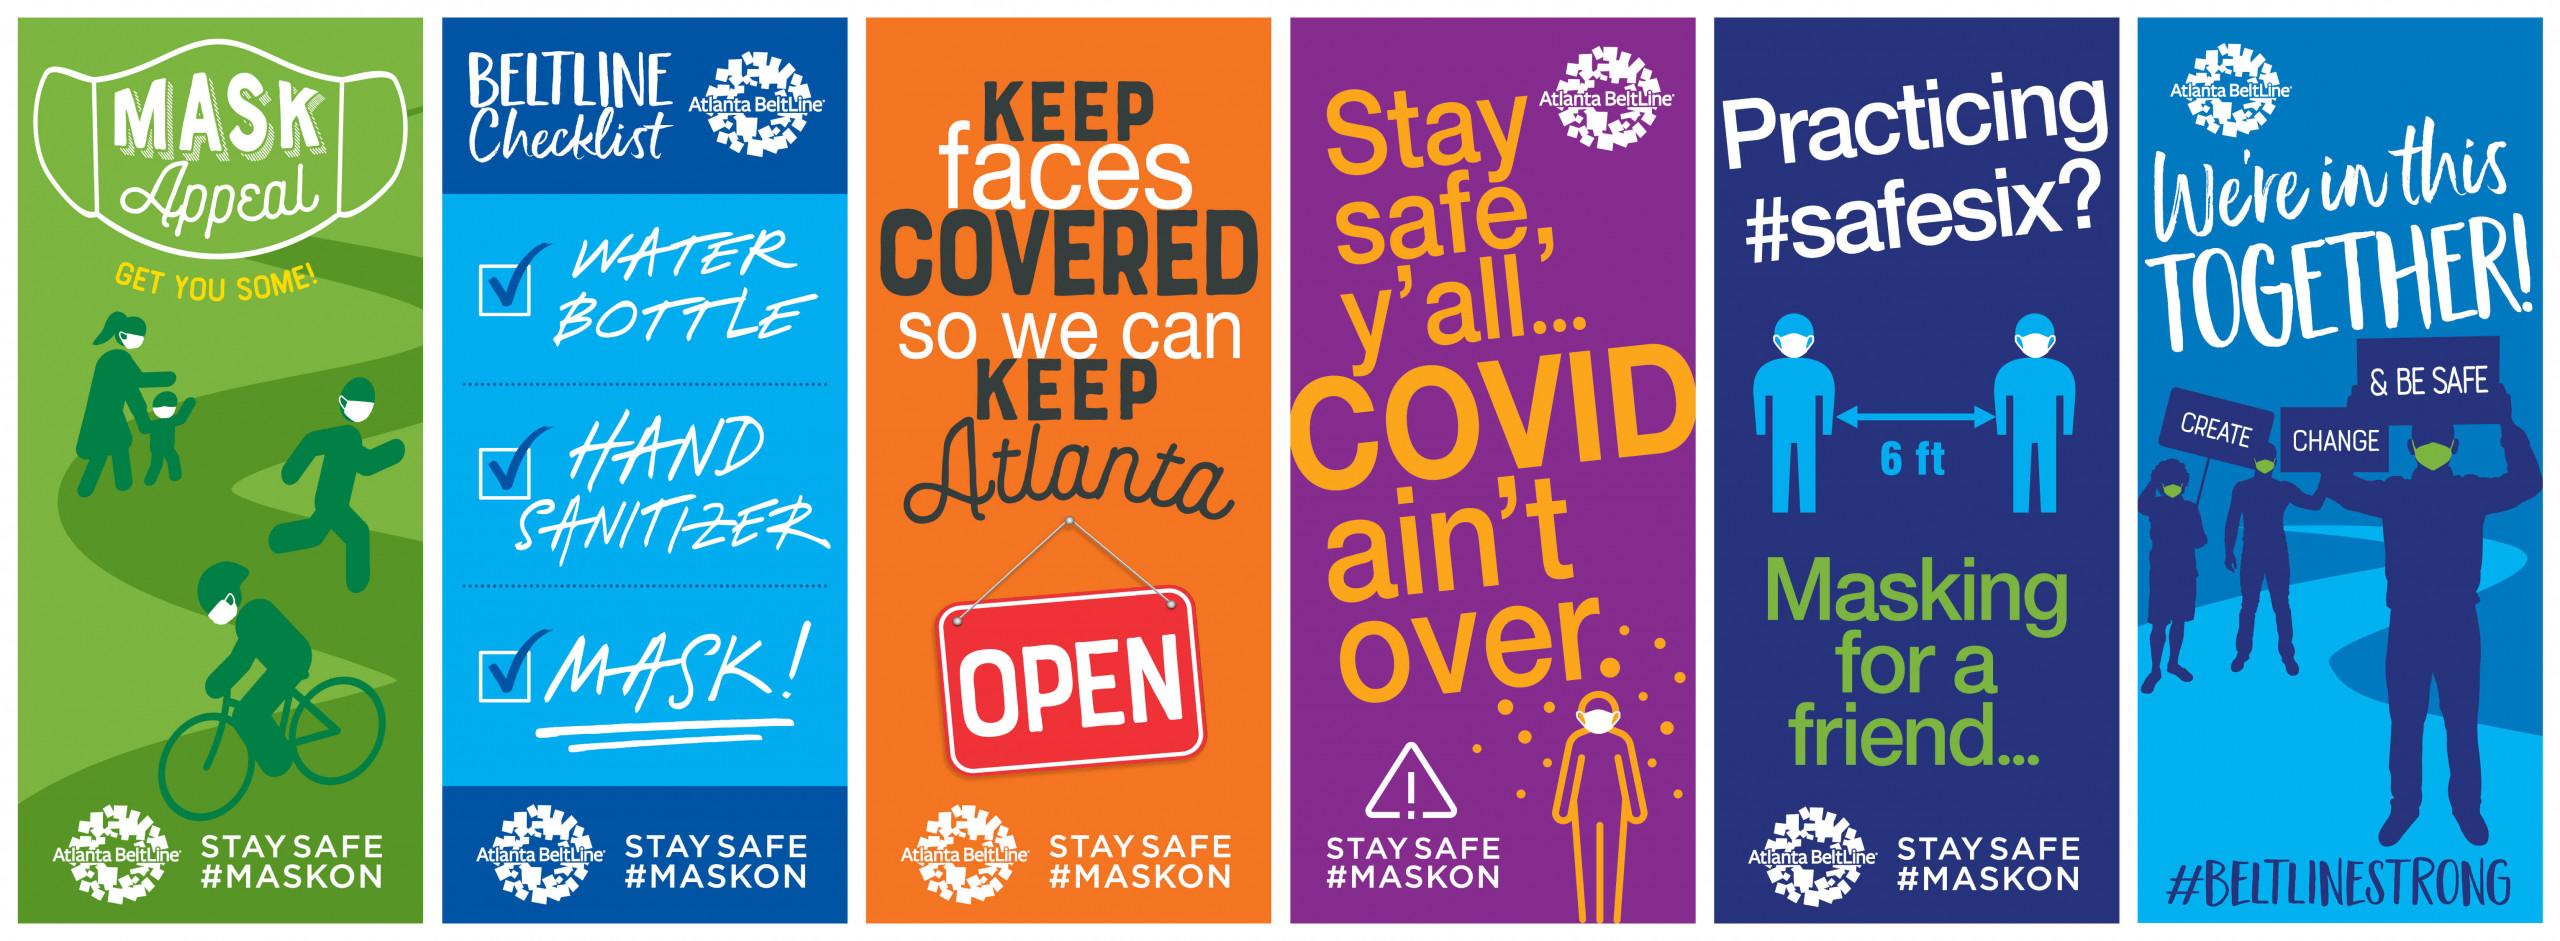 Social distancing COVID-19 Atlanta BeltLine signage